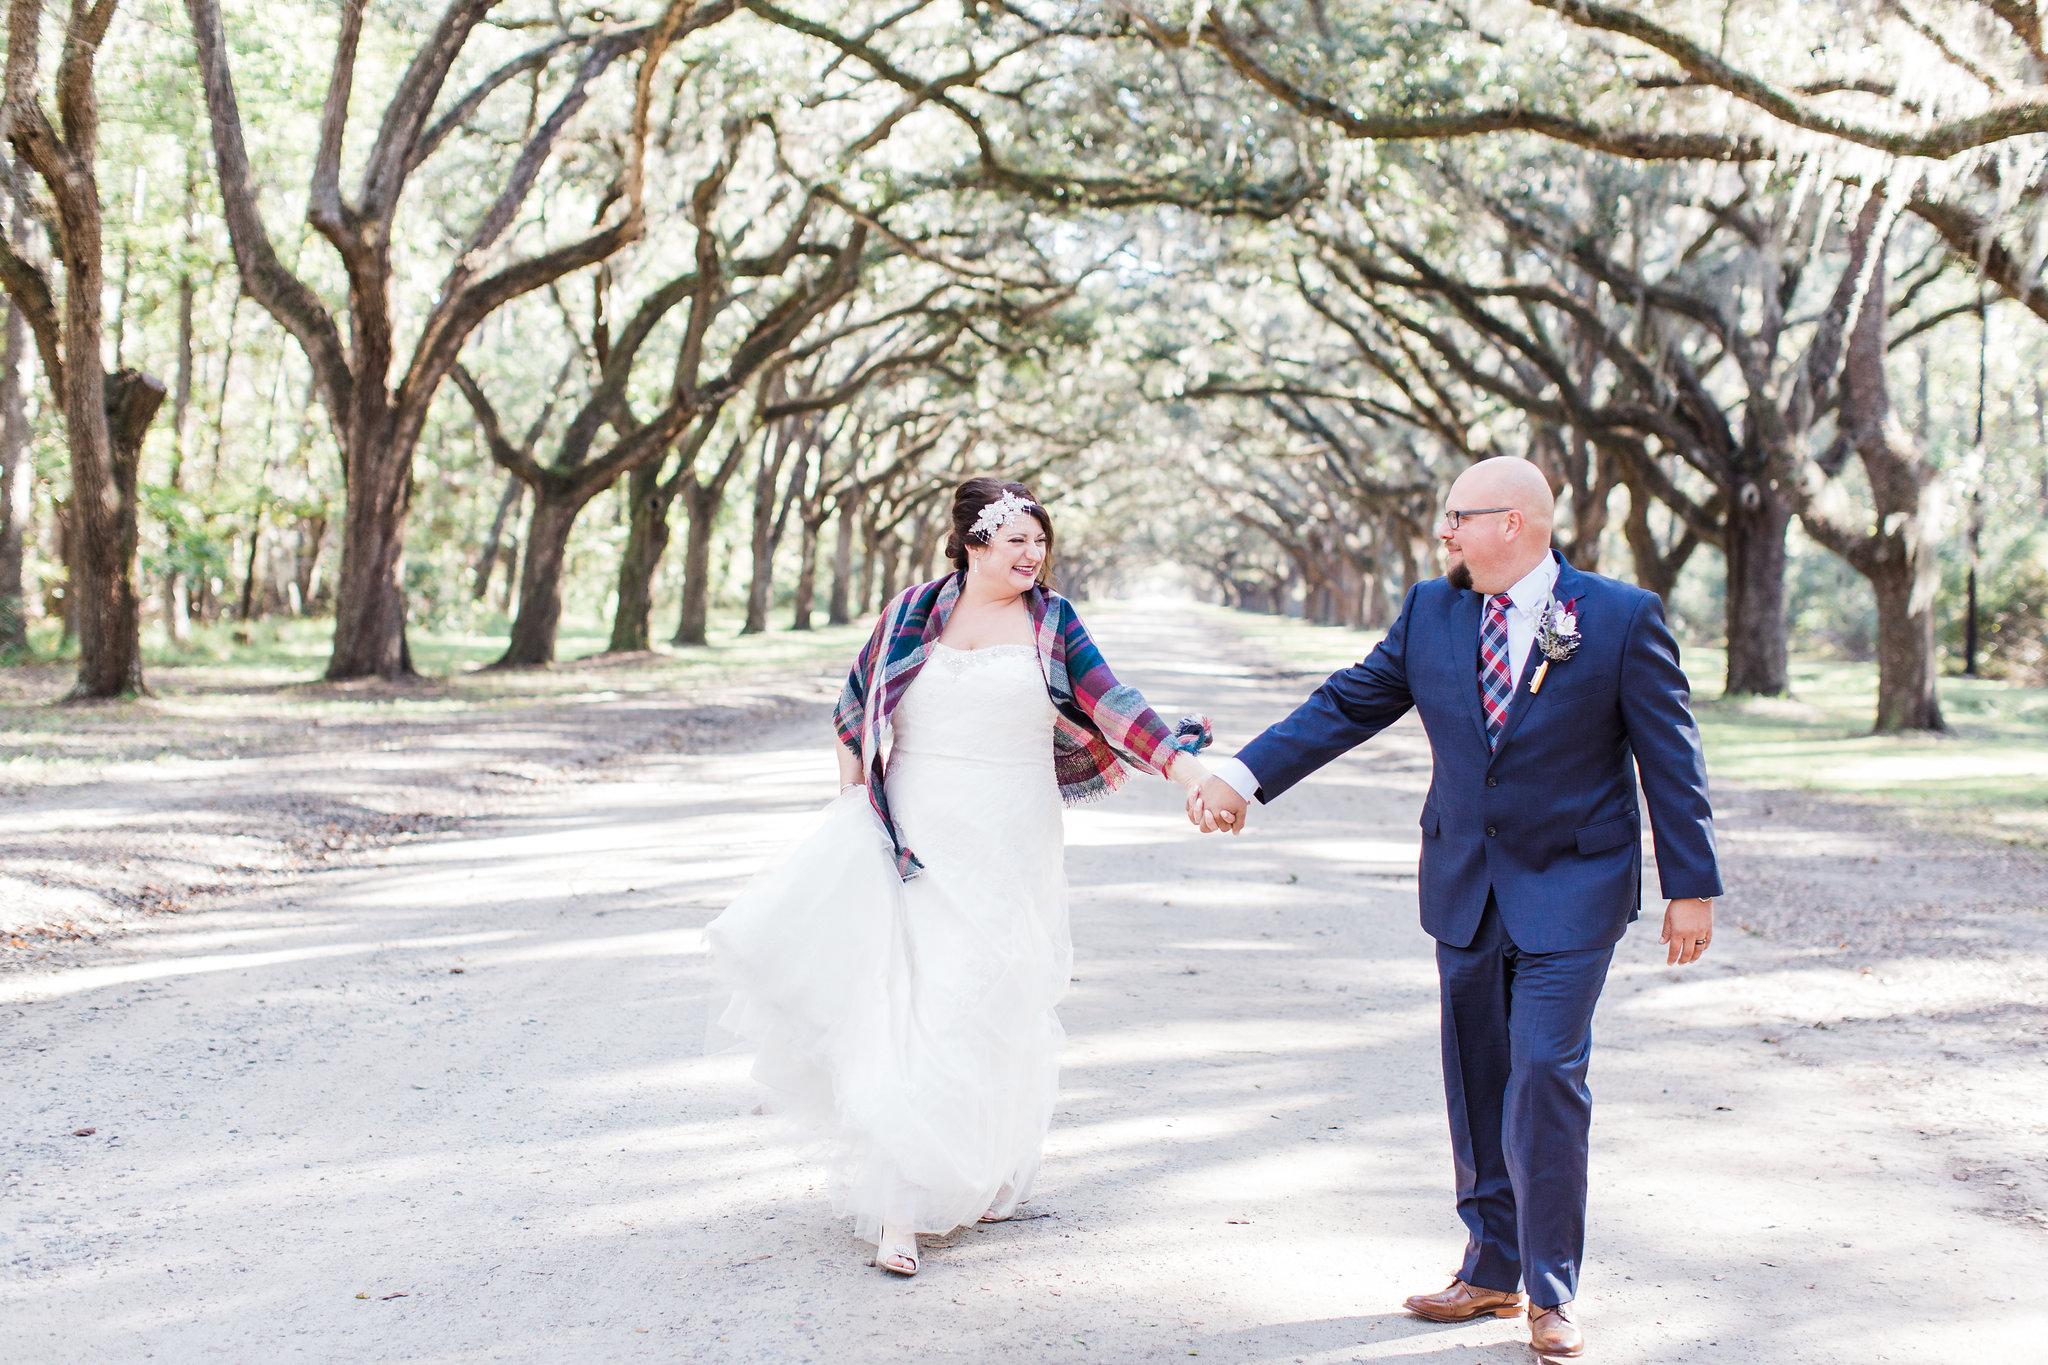 apt-b-photography-kristy-rob-wormsloe-elopment-savannah-wedding-photographer-savannah-elopement-wormsloe-wedding-historic-savannah-elopement-photographer-31.jpg